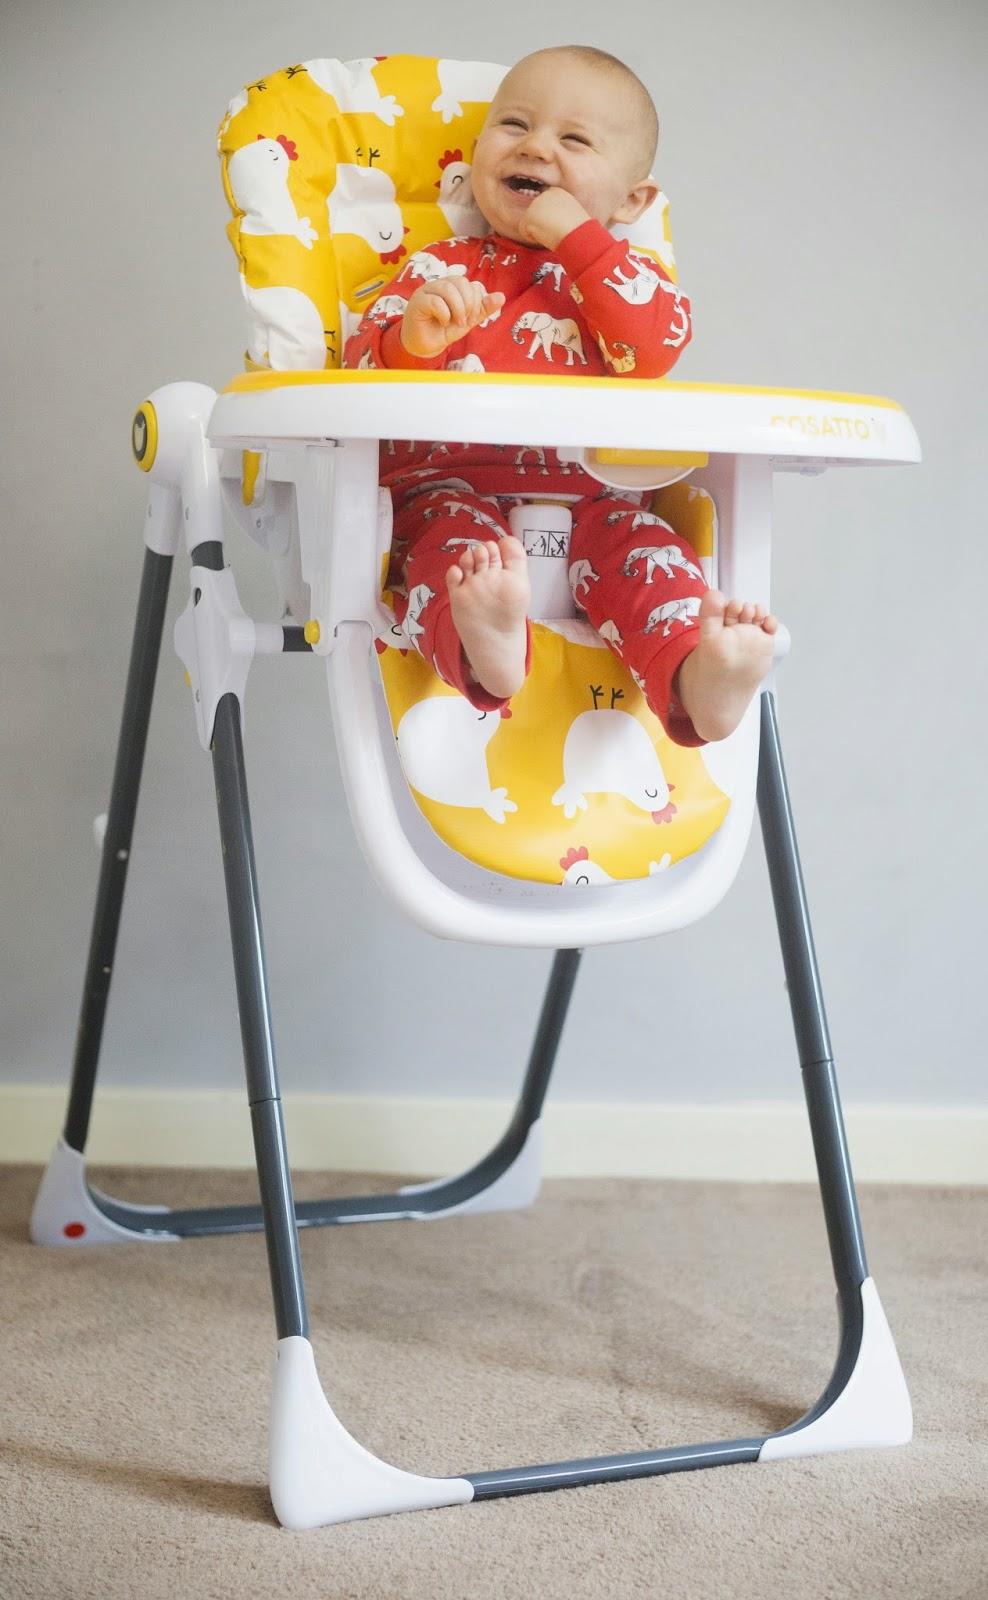 фото стульчика Косатто Noodle Supa